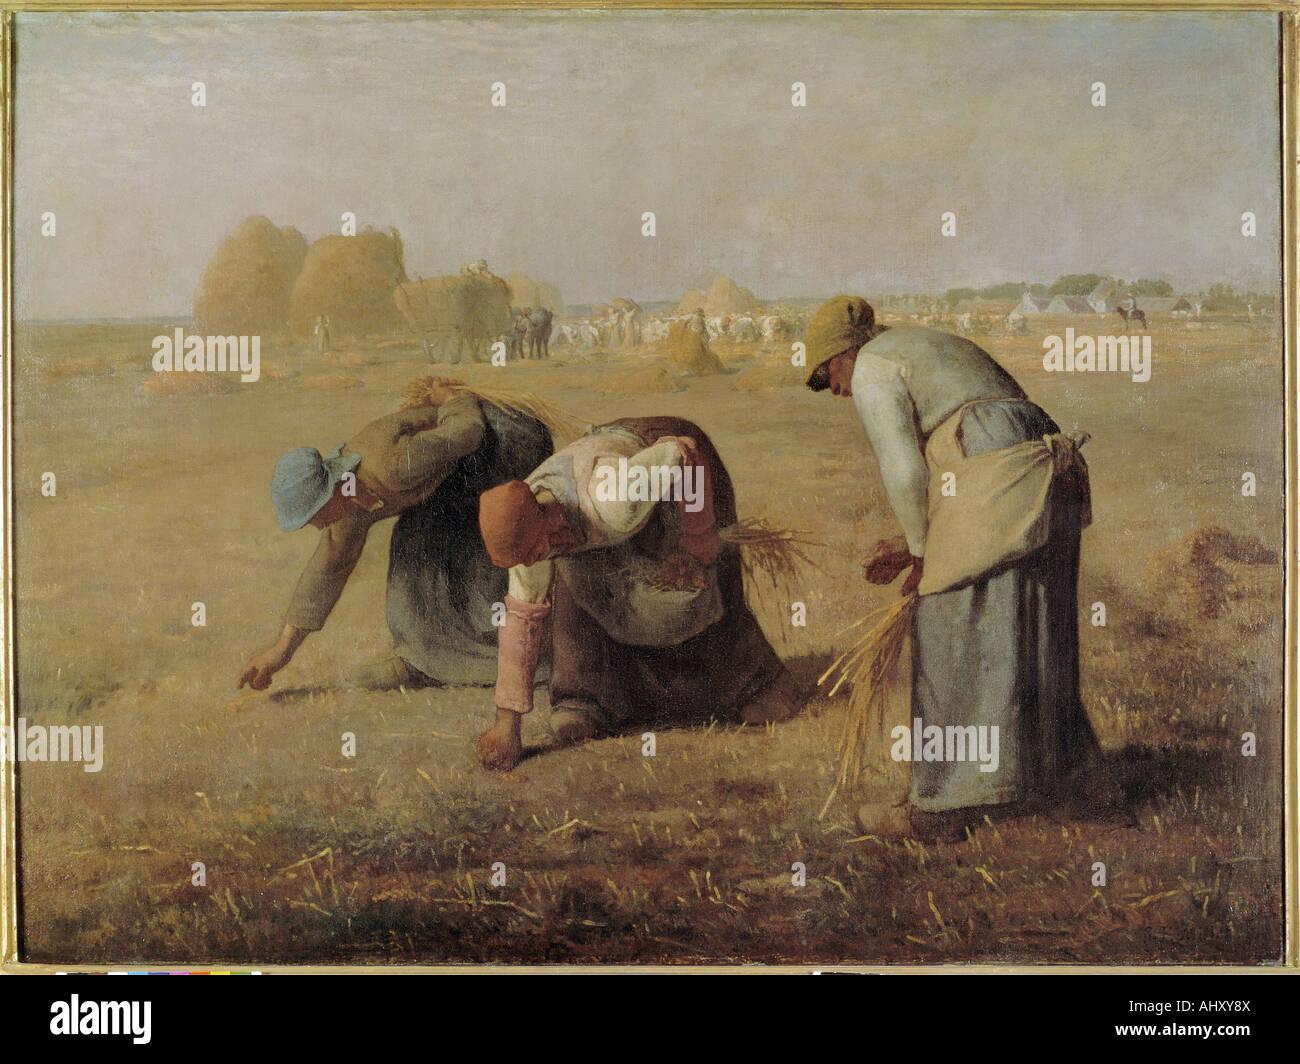 """Belle Arti, miglio, Jean-Francois (1814 - 1875), pittura, 'Le Spigolatrici"", 1857, olio su tela, Louvre, Parigi, Francese, realismo Foto Stock"